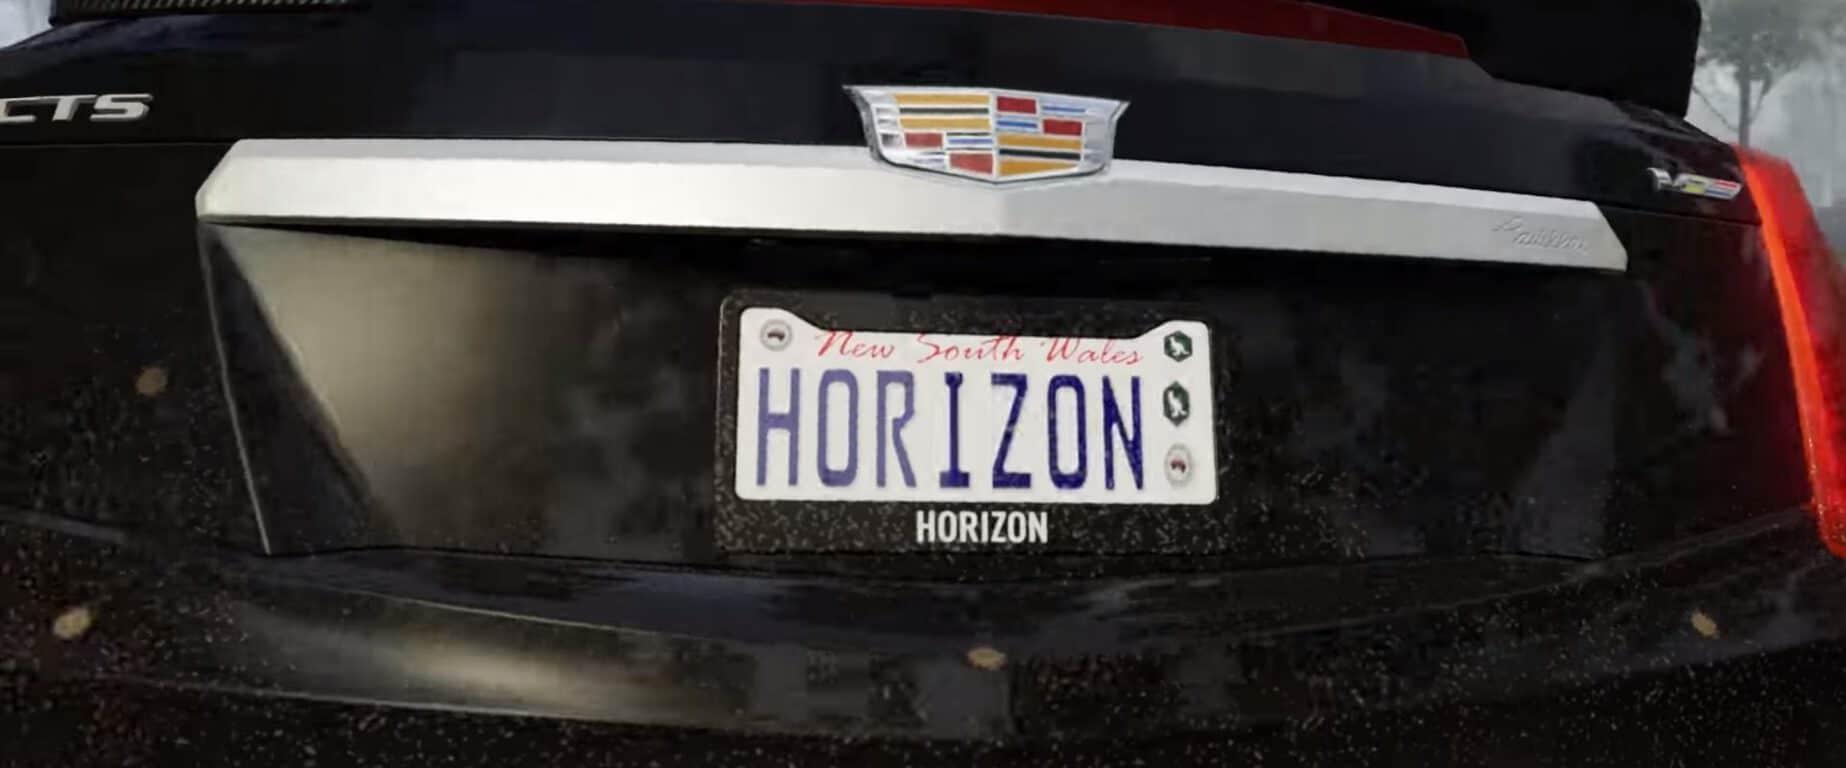 That massive 53 GB Forza Horizon 3 update on Windows 10 was an